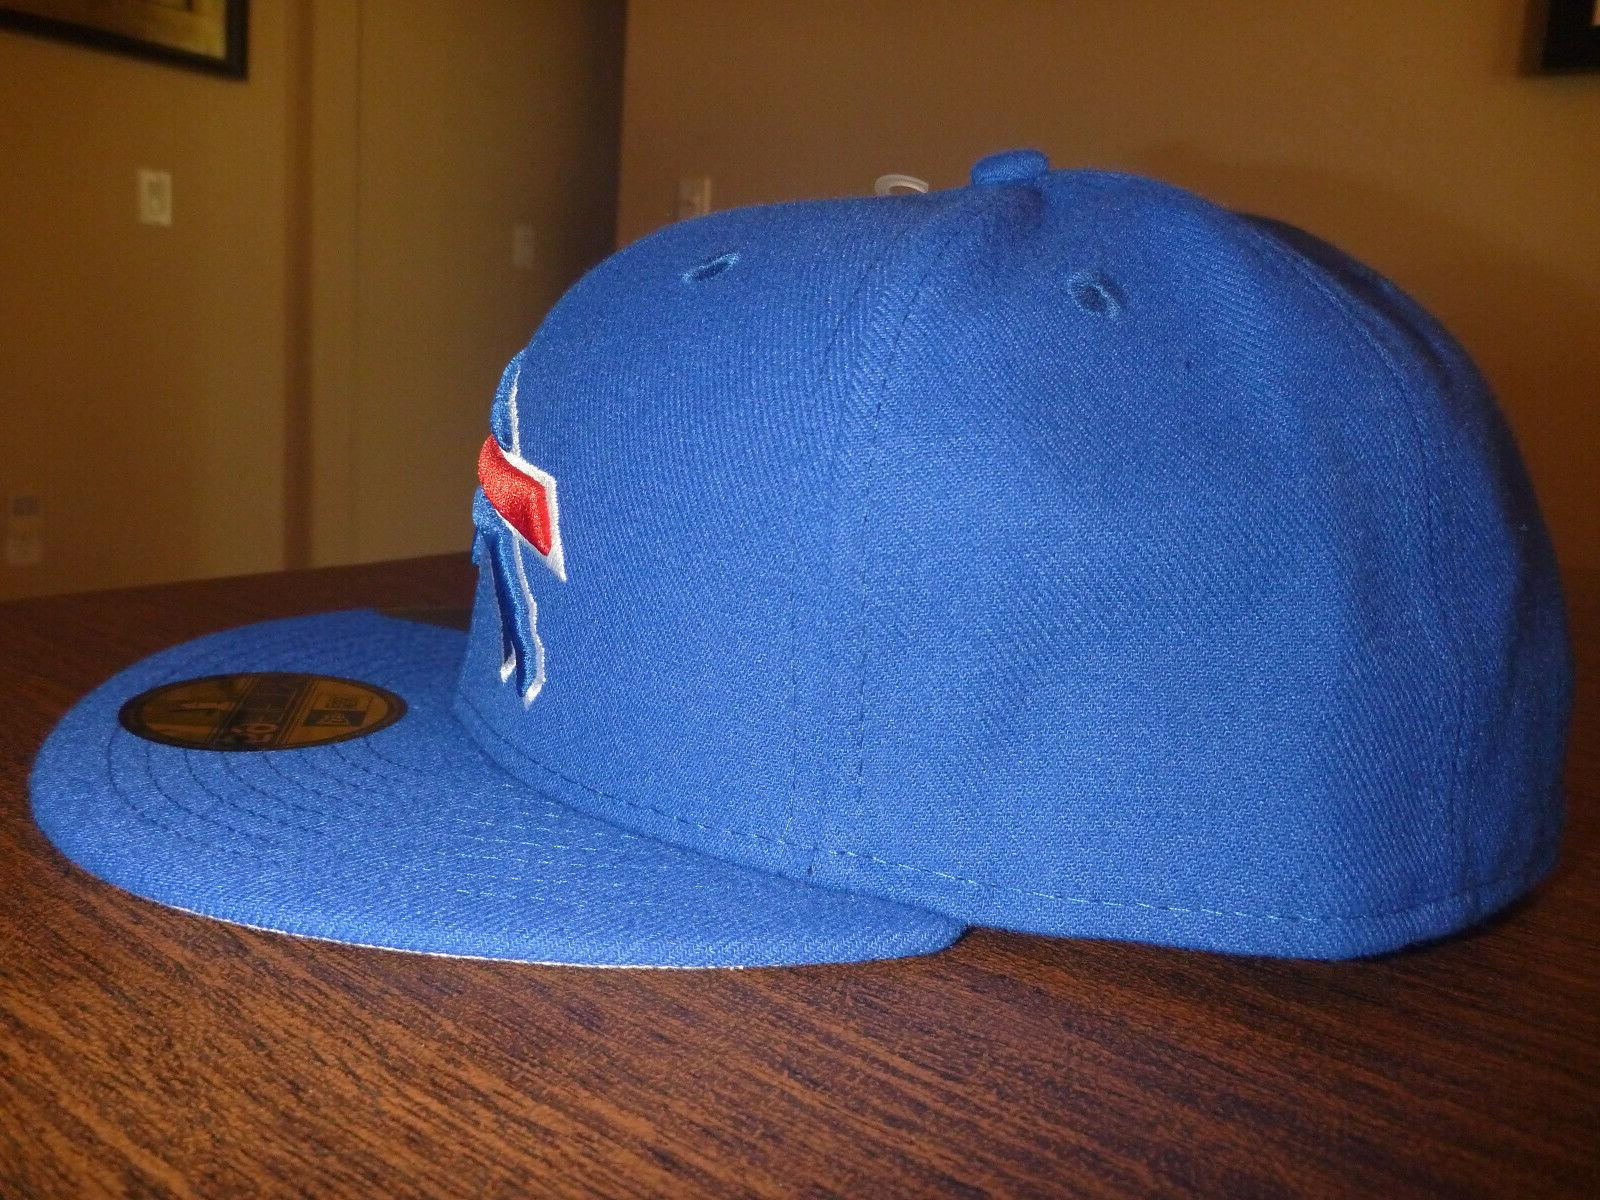 BUFFALO BILLS NEW ERA 59FIFTY NFL ON TEAM BASIC BLUE FITTED HAT